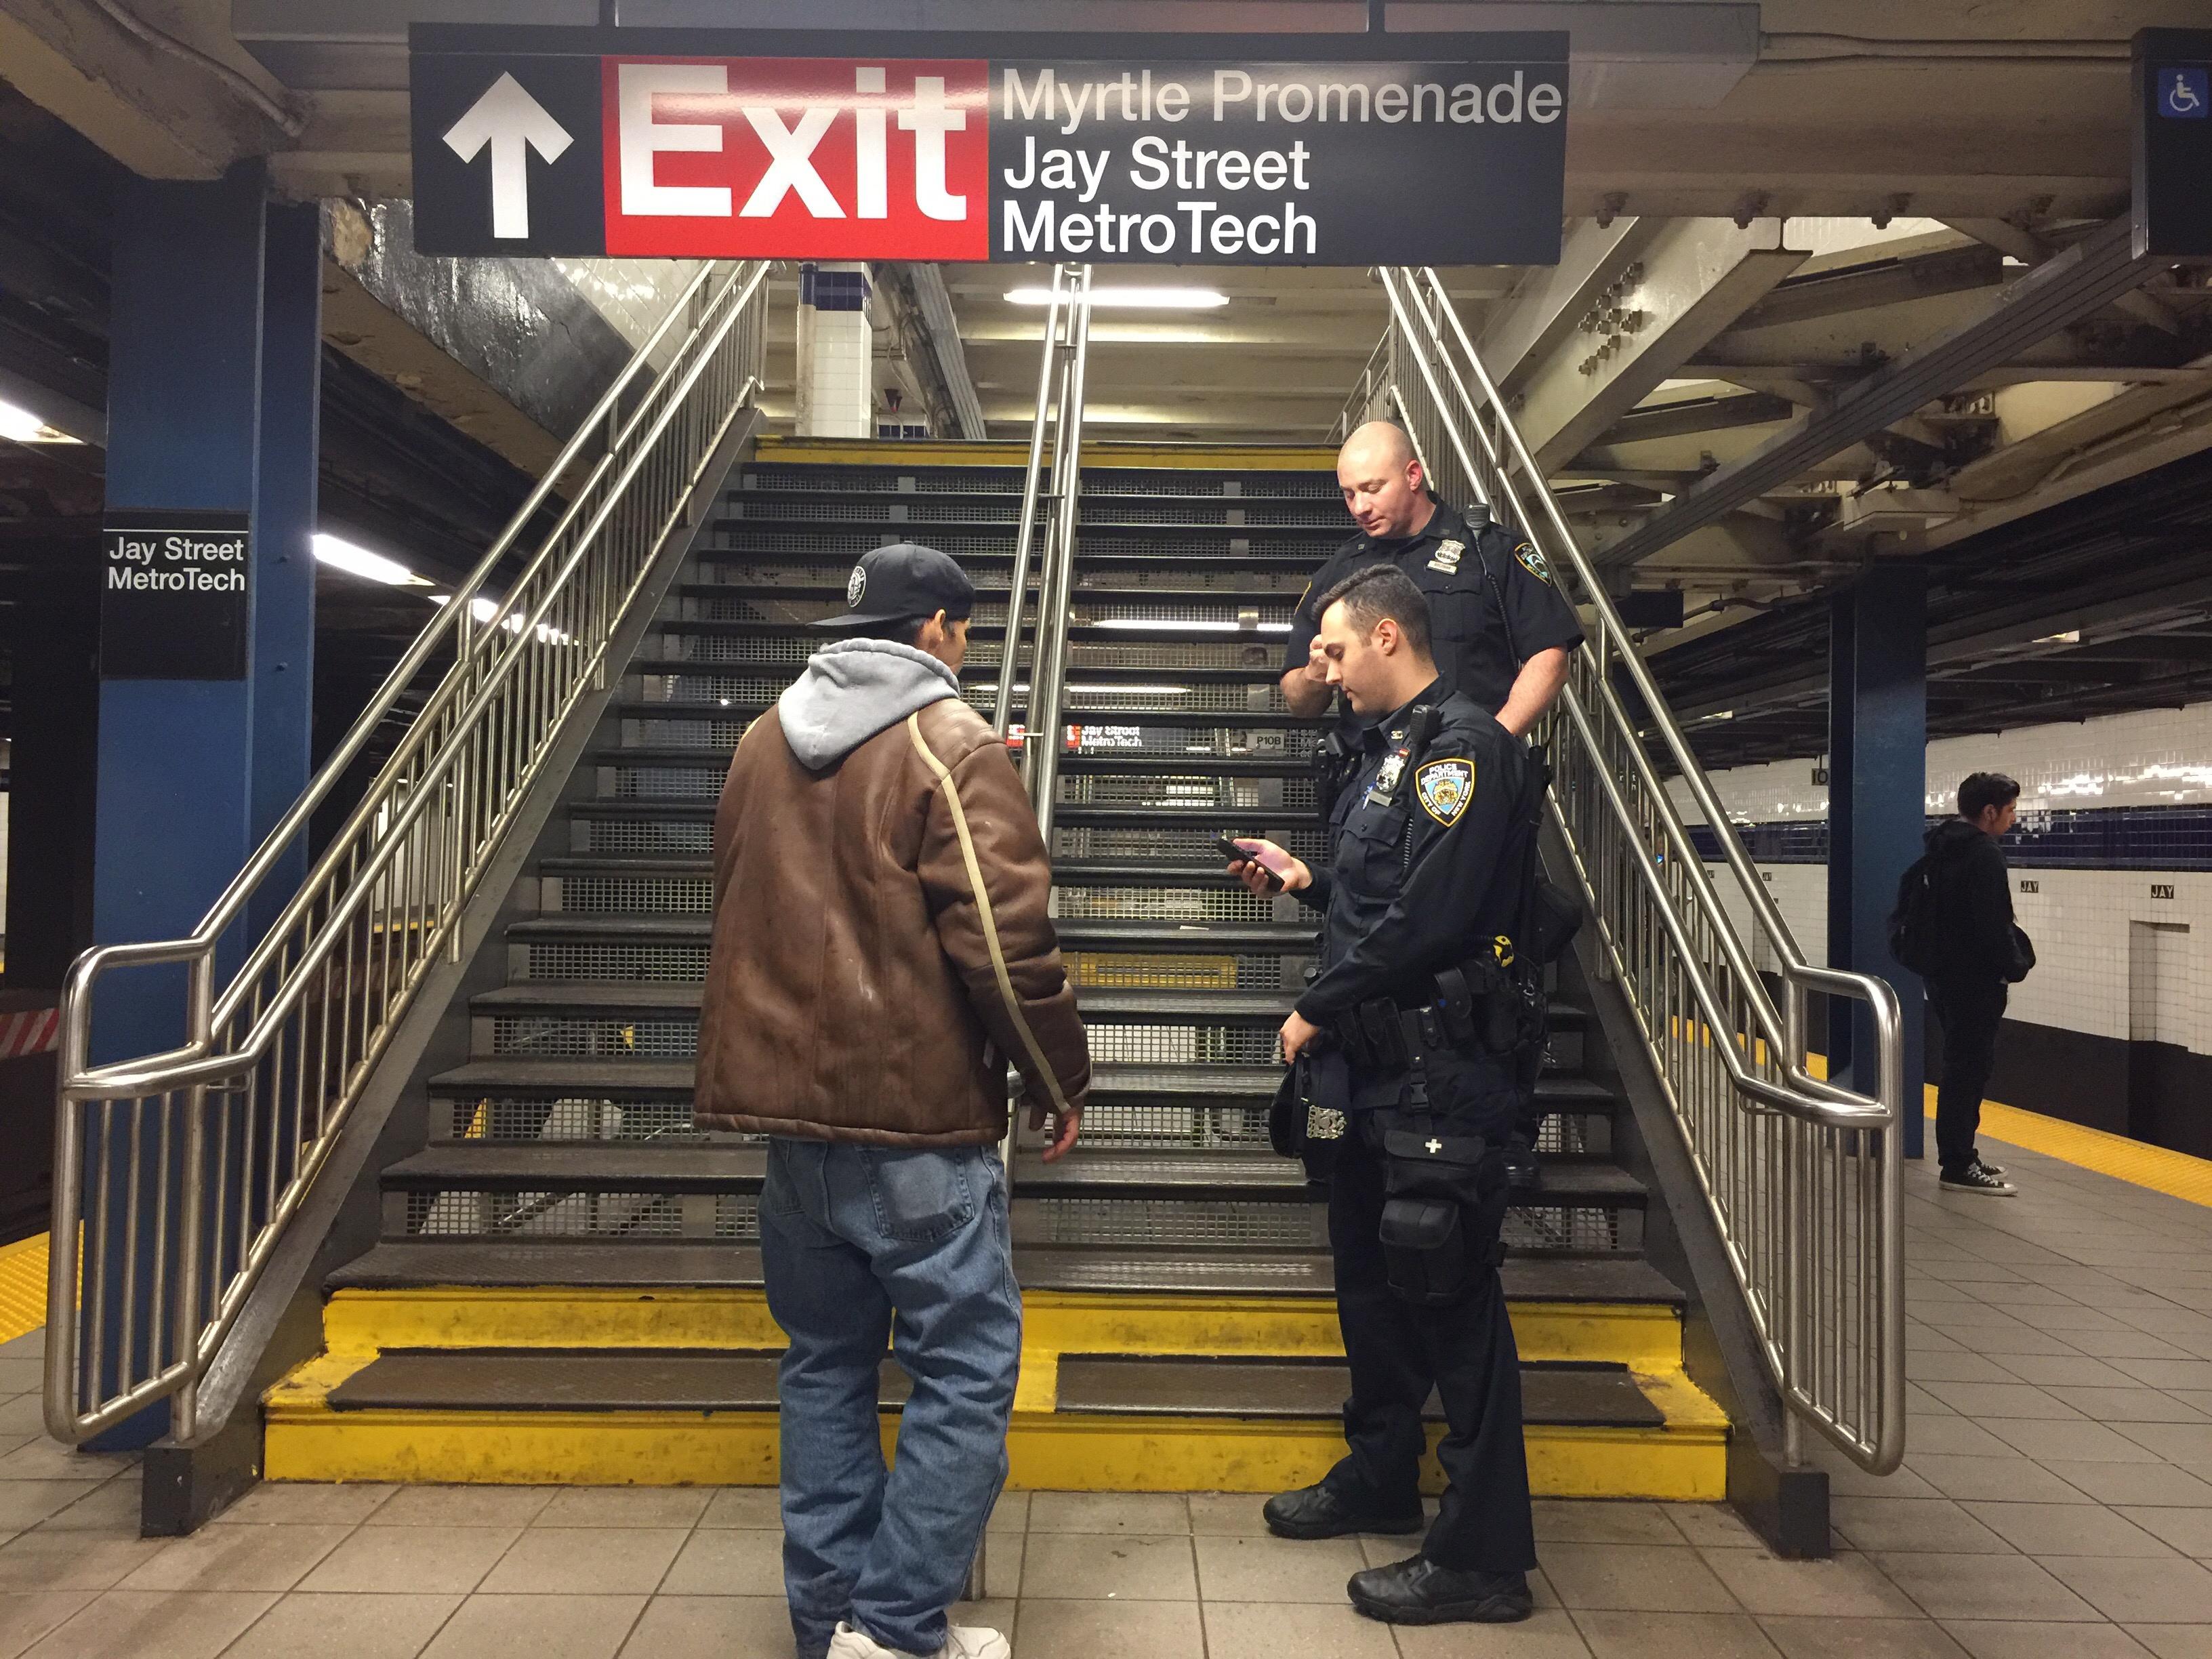 Hallan dos cadáveres apuñalados en el Metro de Nueva York en un lapso de dos horas; posible asesino en serie